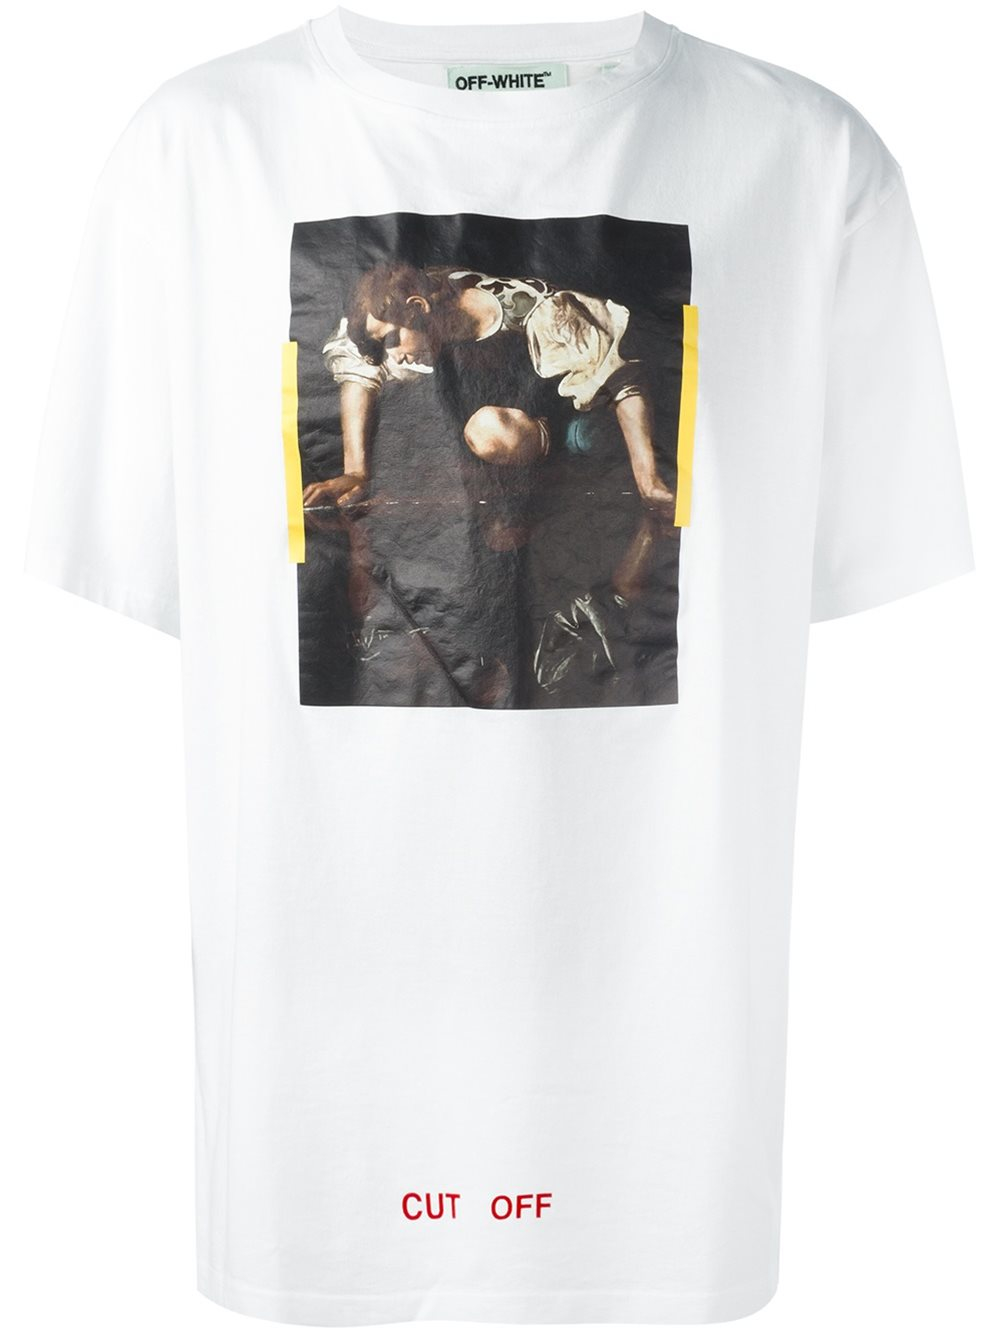 off white c o virgil abloh cut off printed t shirt in white for men lyst. Black Bedroom Furniture Sets. Home Design Ideas